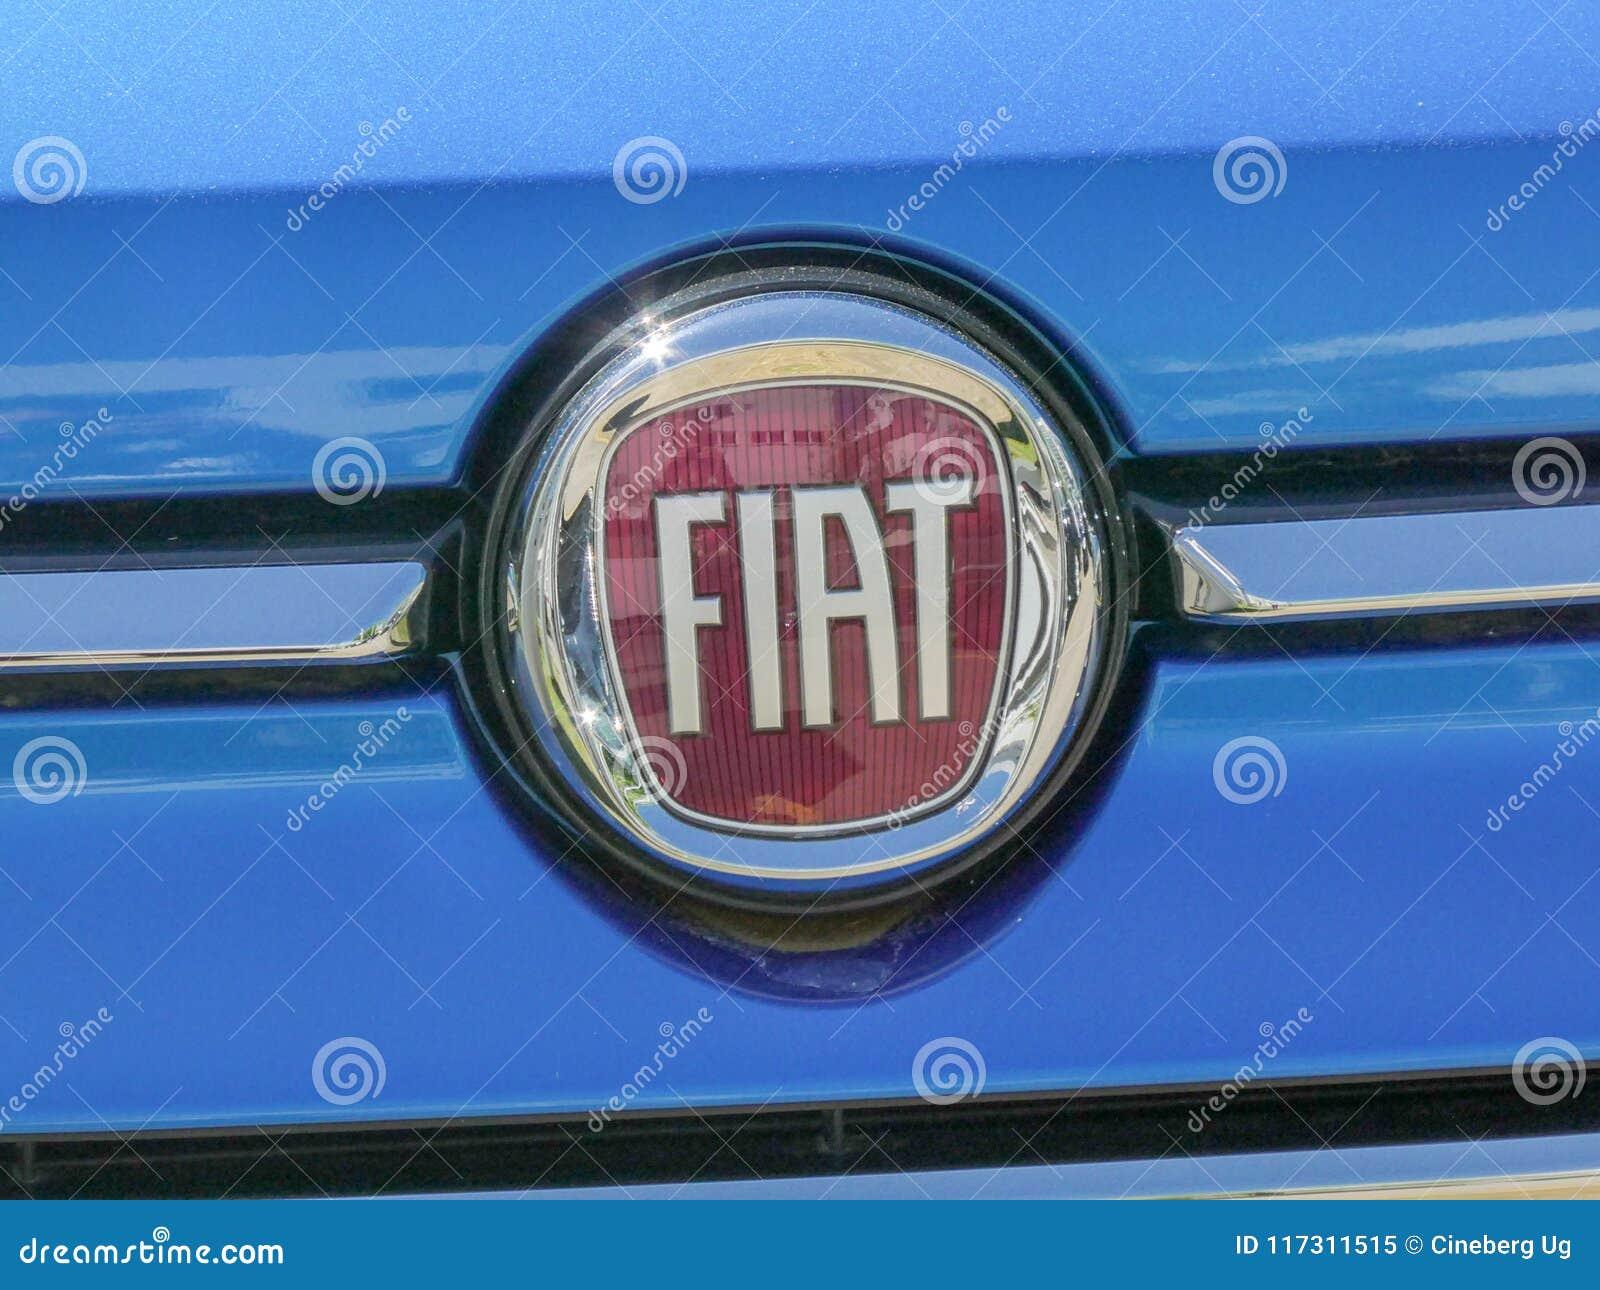 Fiat Car Emblem Editorial Image Image Of Fiat Logos 117311515